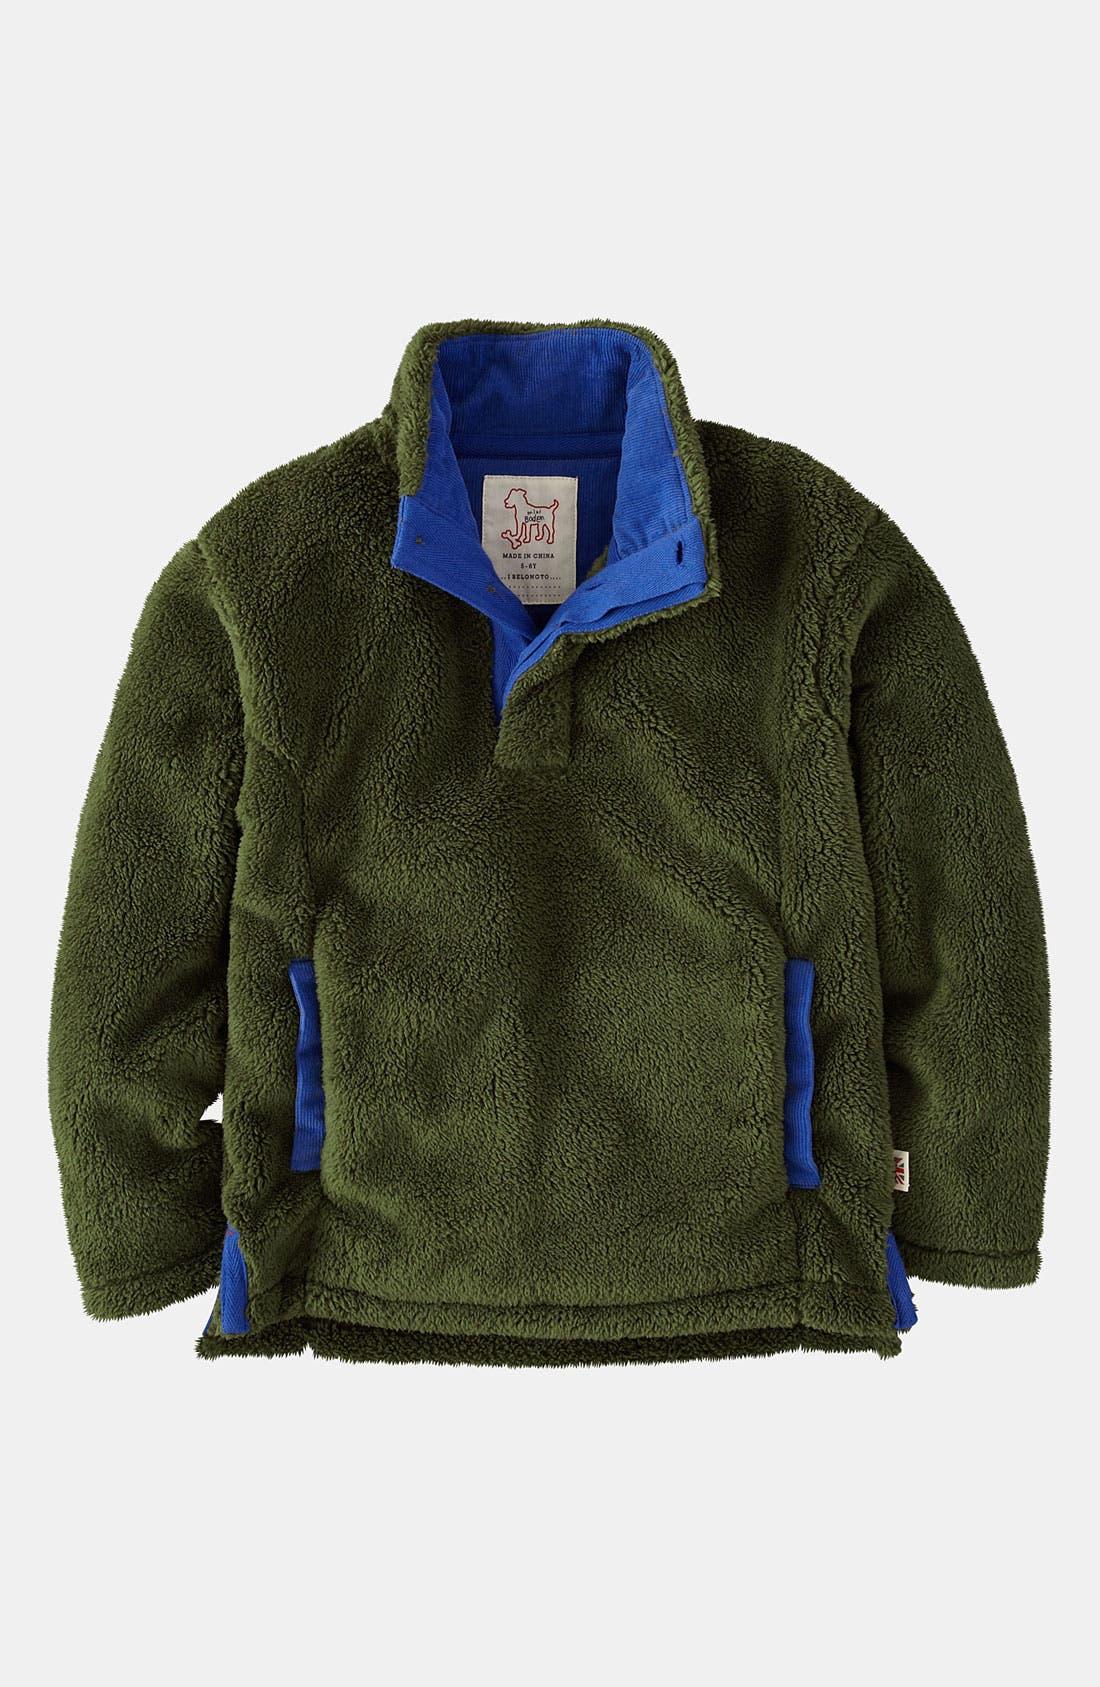 Main Image - Mini Boden Half Placket Fleece Jacket (Toddler)